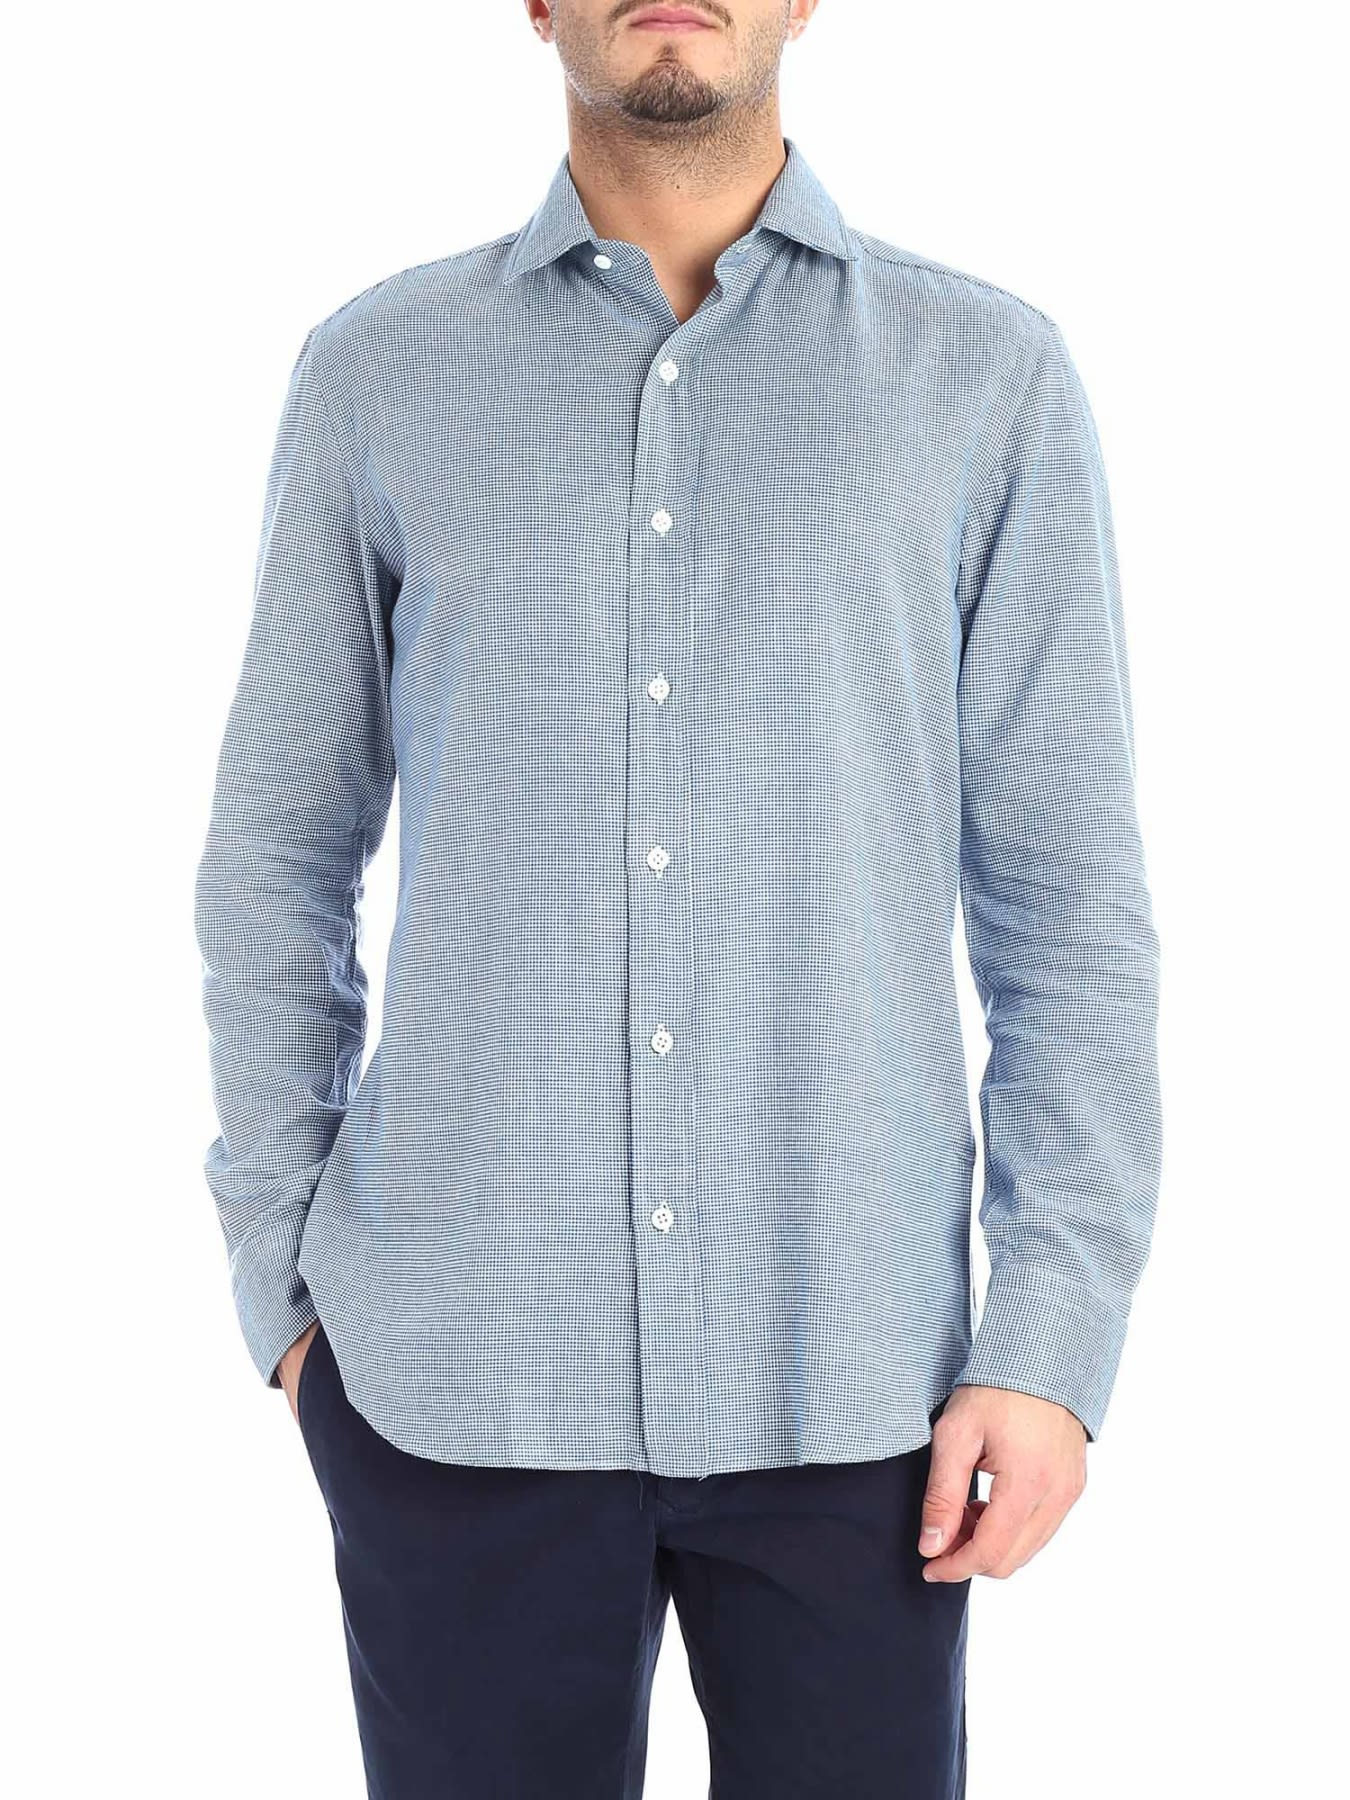 SALVATORE PICCOLO Shirt Flannel in Heavenly